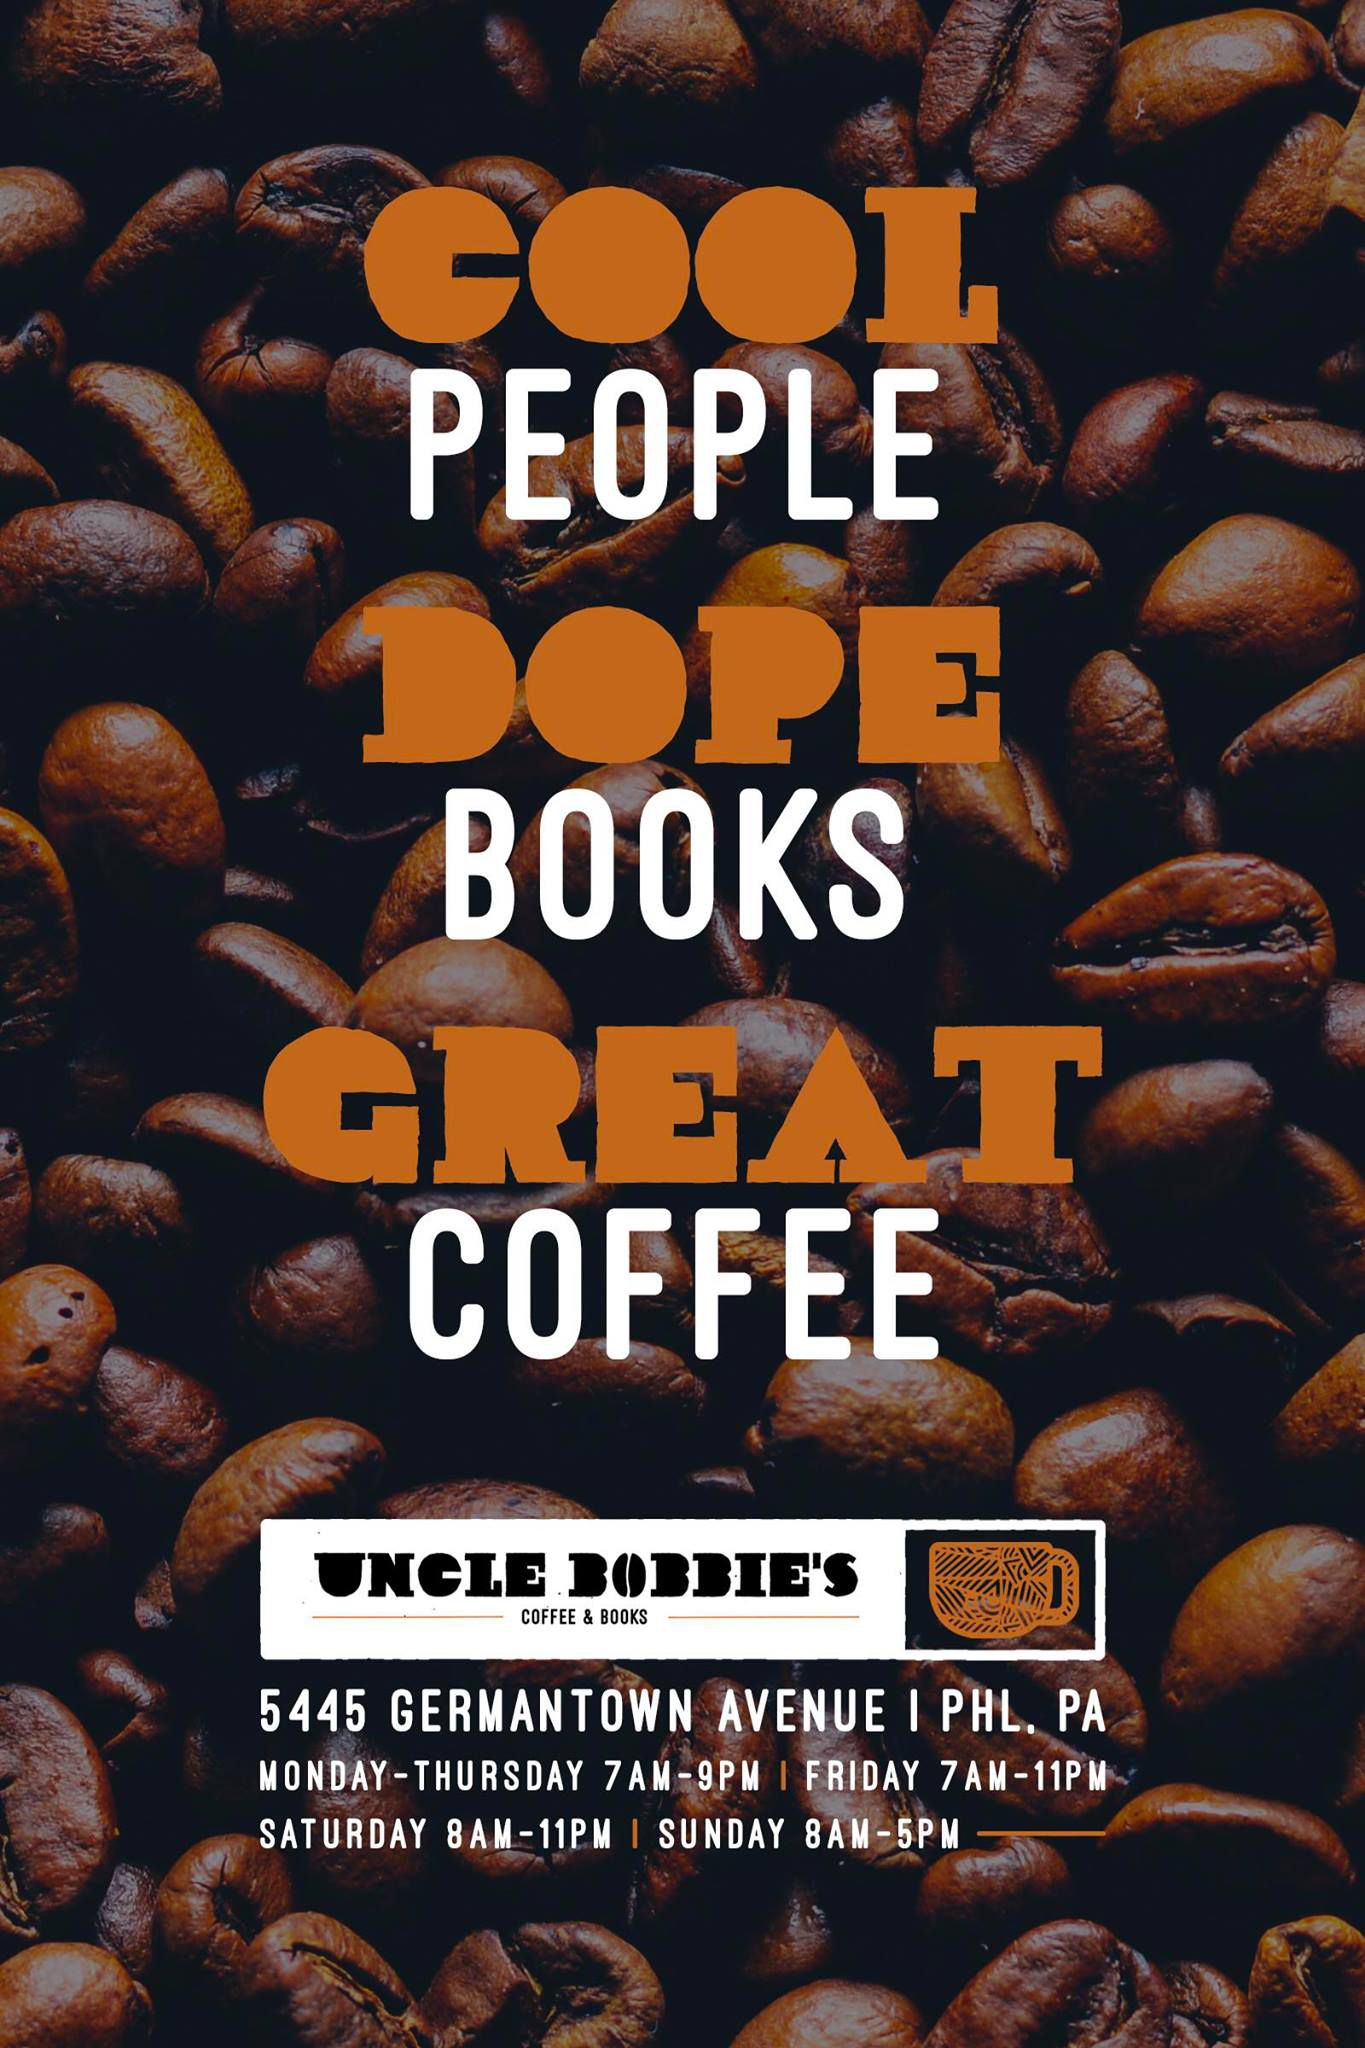 Uncle Bobbie's bookstore in Philadelphia